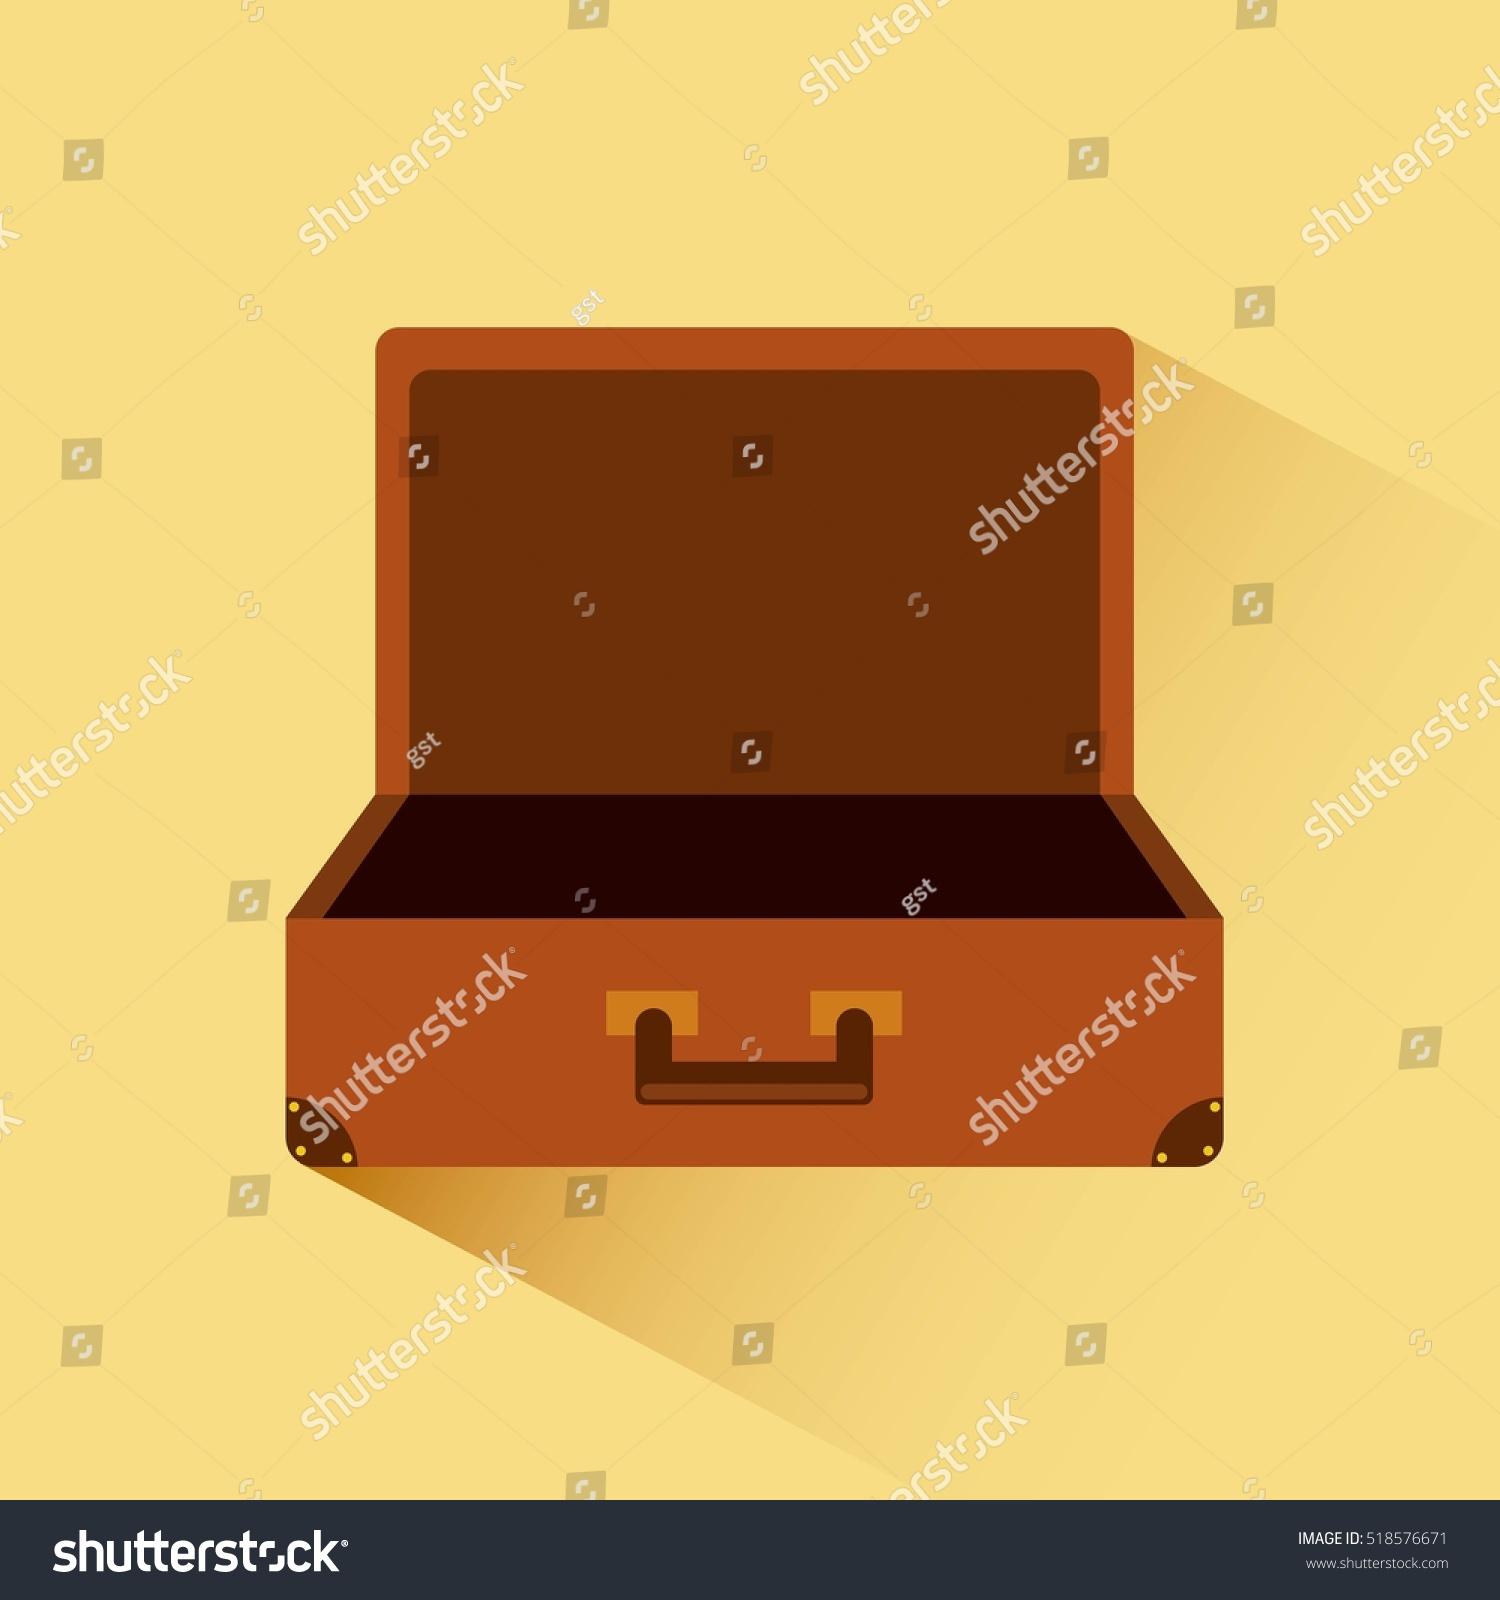 Open Briefcase Images Stock Photos amp Vectors  Shutterstock